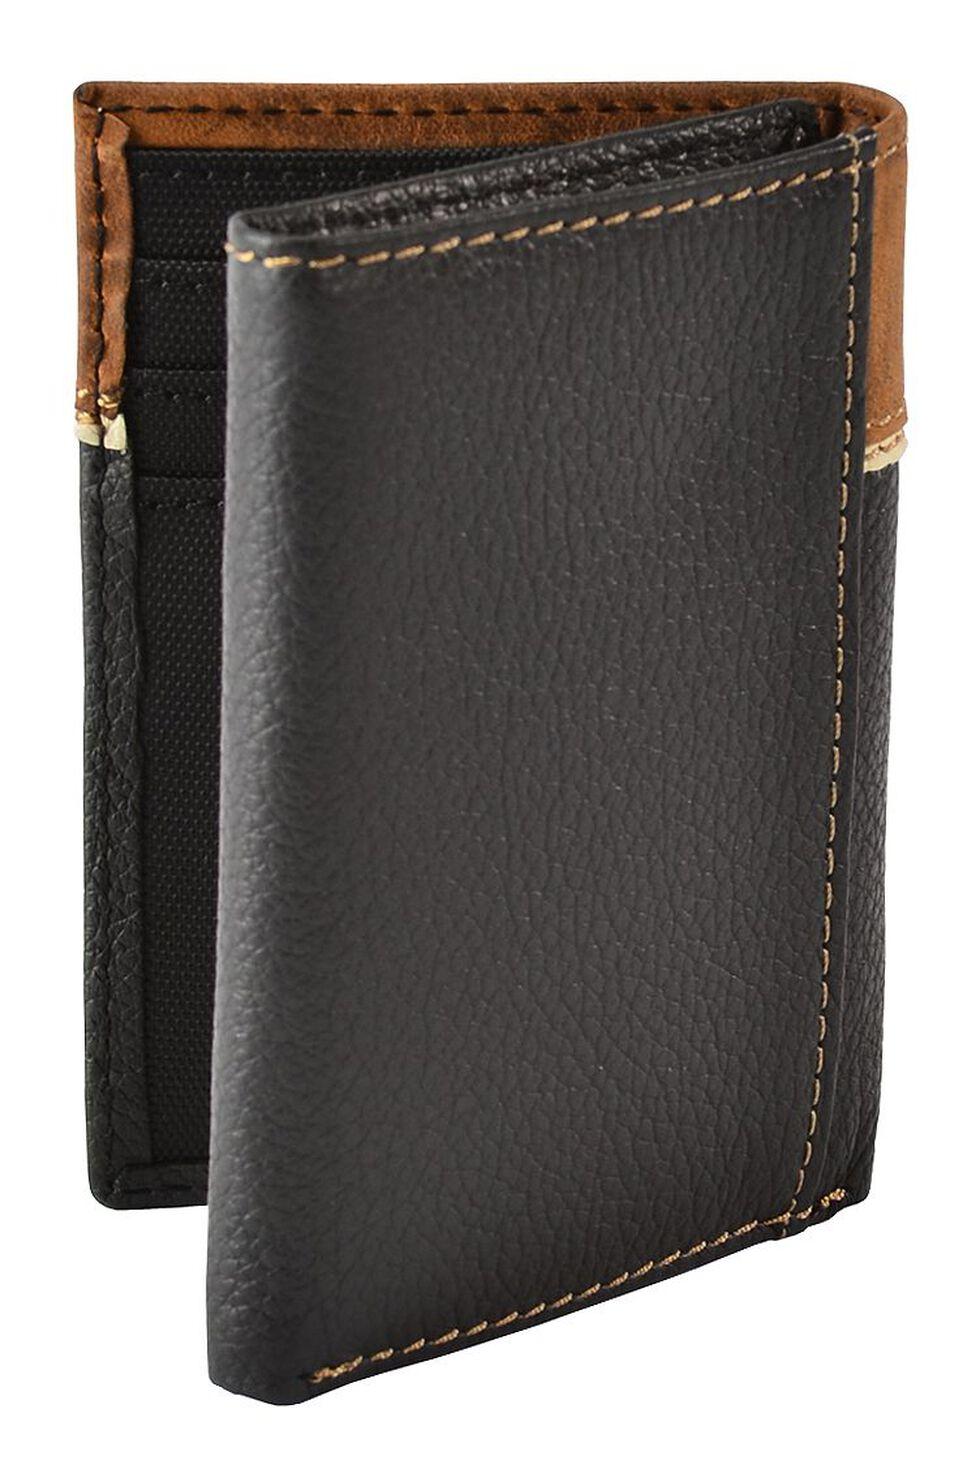 Nocona Leather Overlay Star Concho Tri-Fold Wallet, Black, hi-res